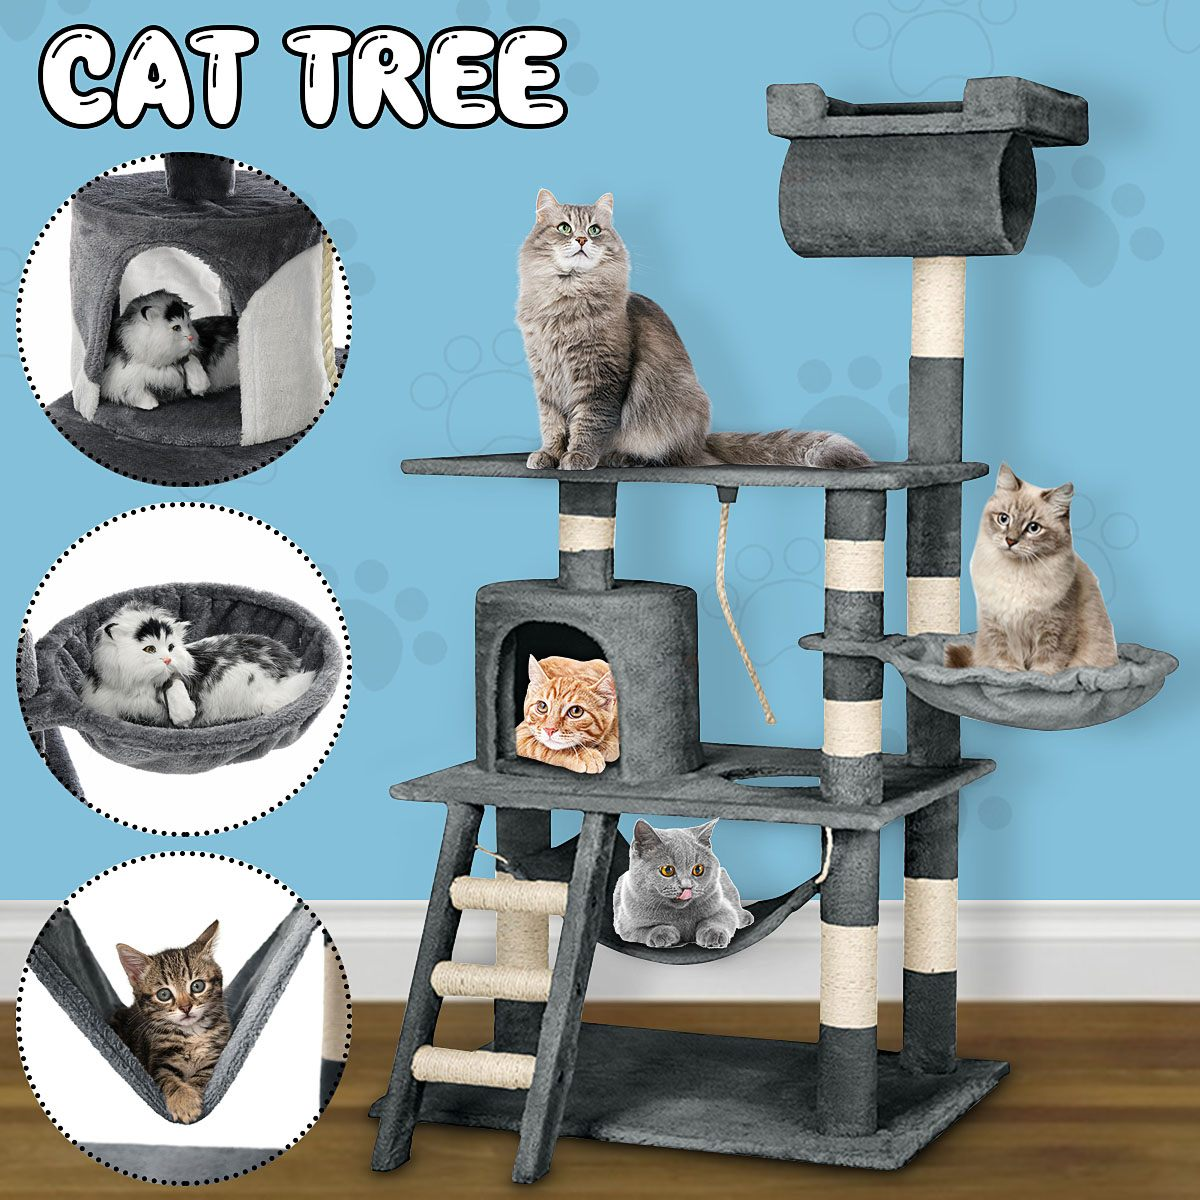 Schnelle Pet Multifunktionale Stuhl Kreative Cube Haus mit Kratzen Abnehmbare Pad Kissen Pet Aktivität Katze Baum